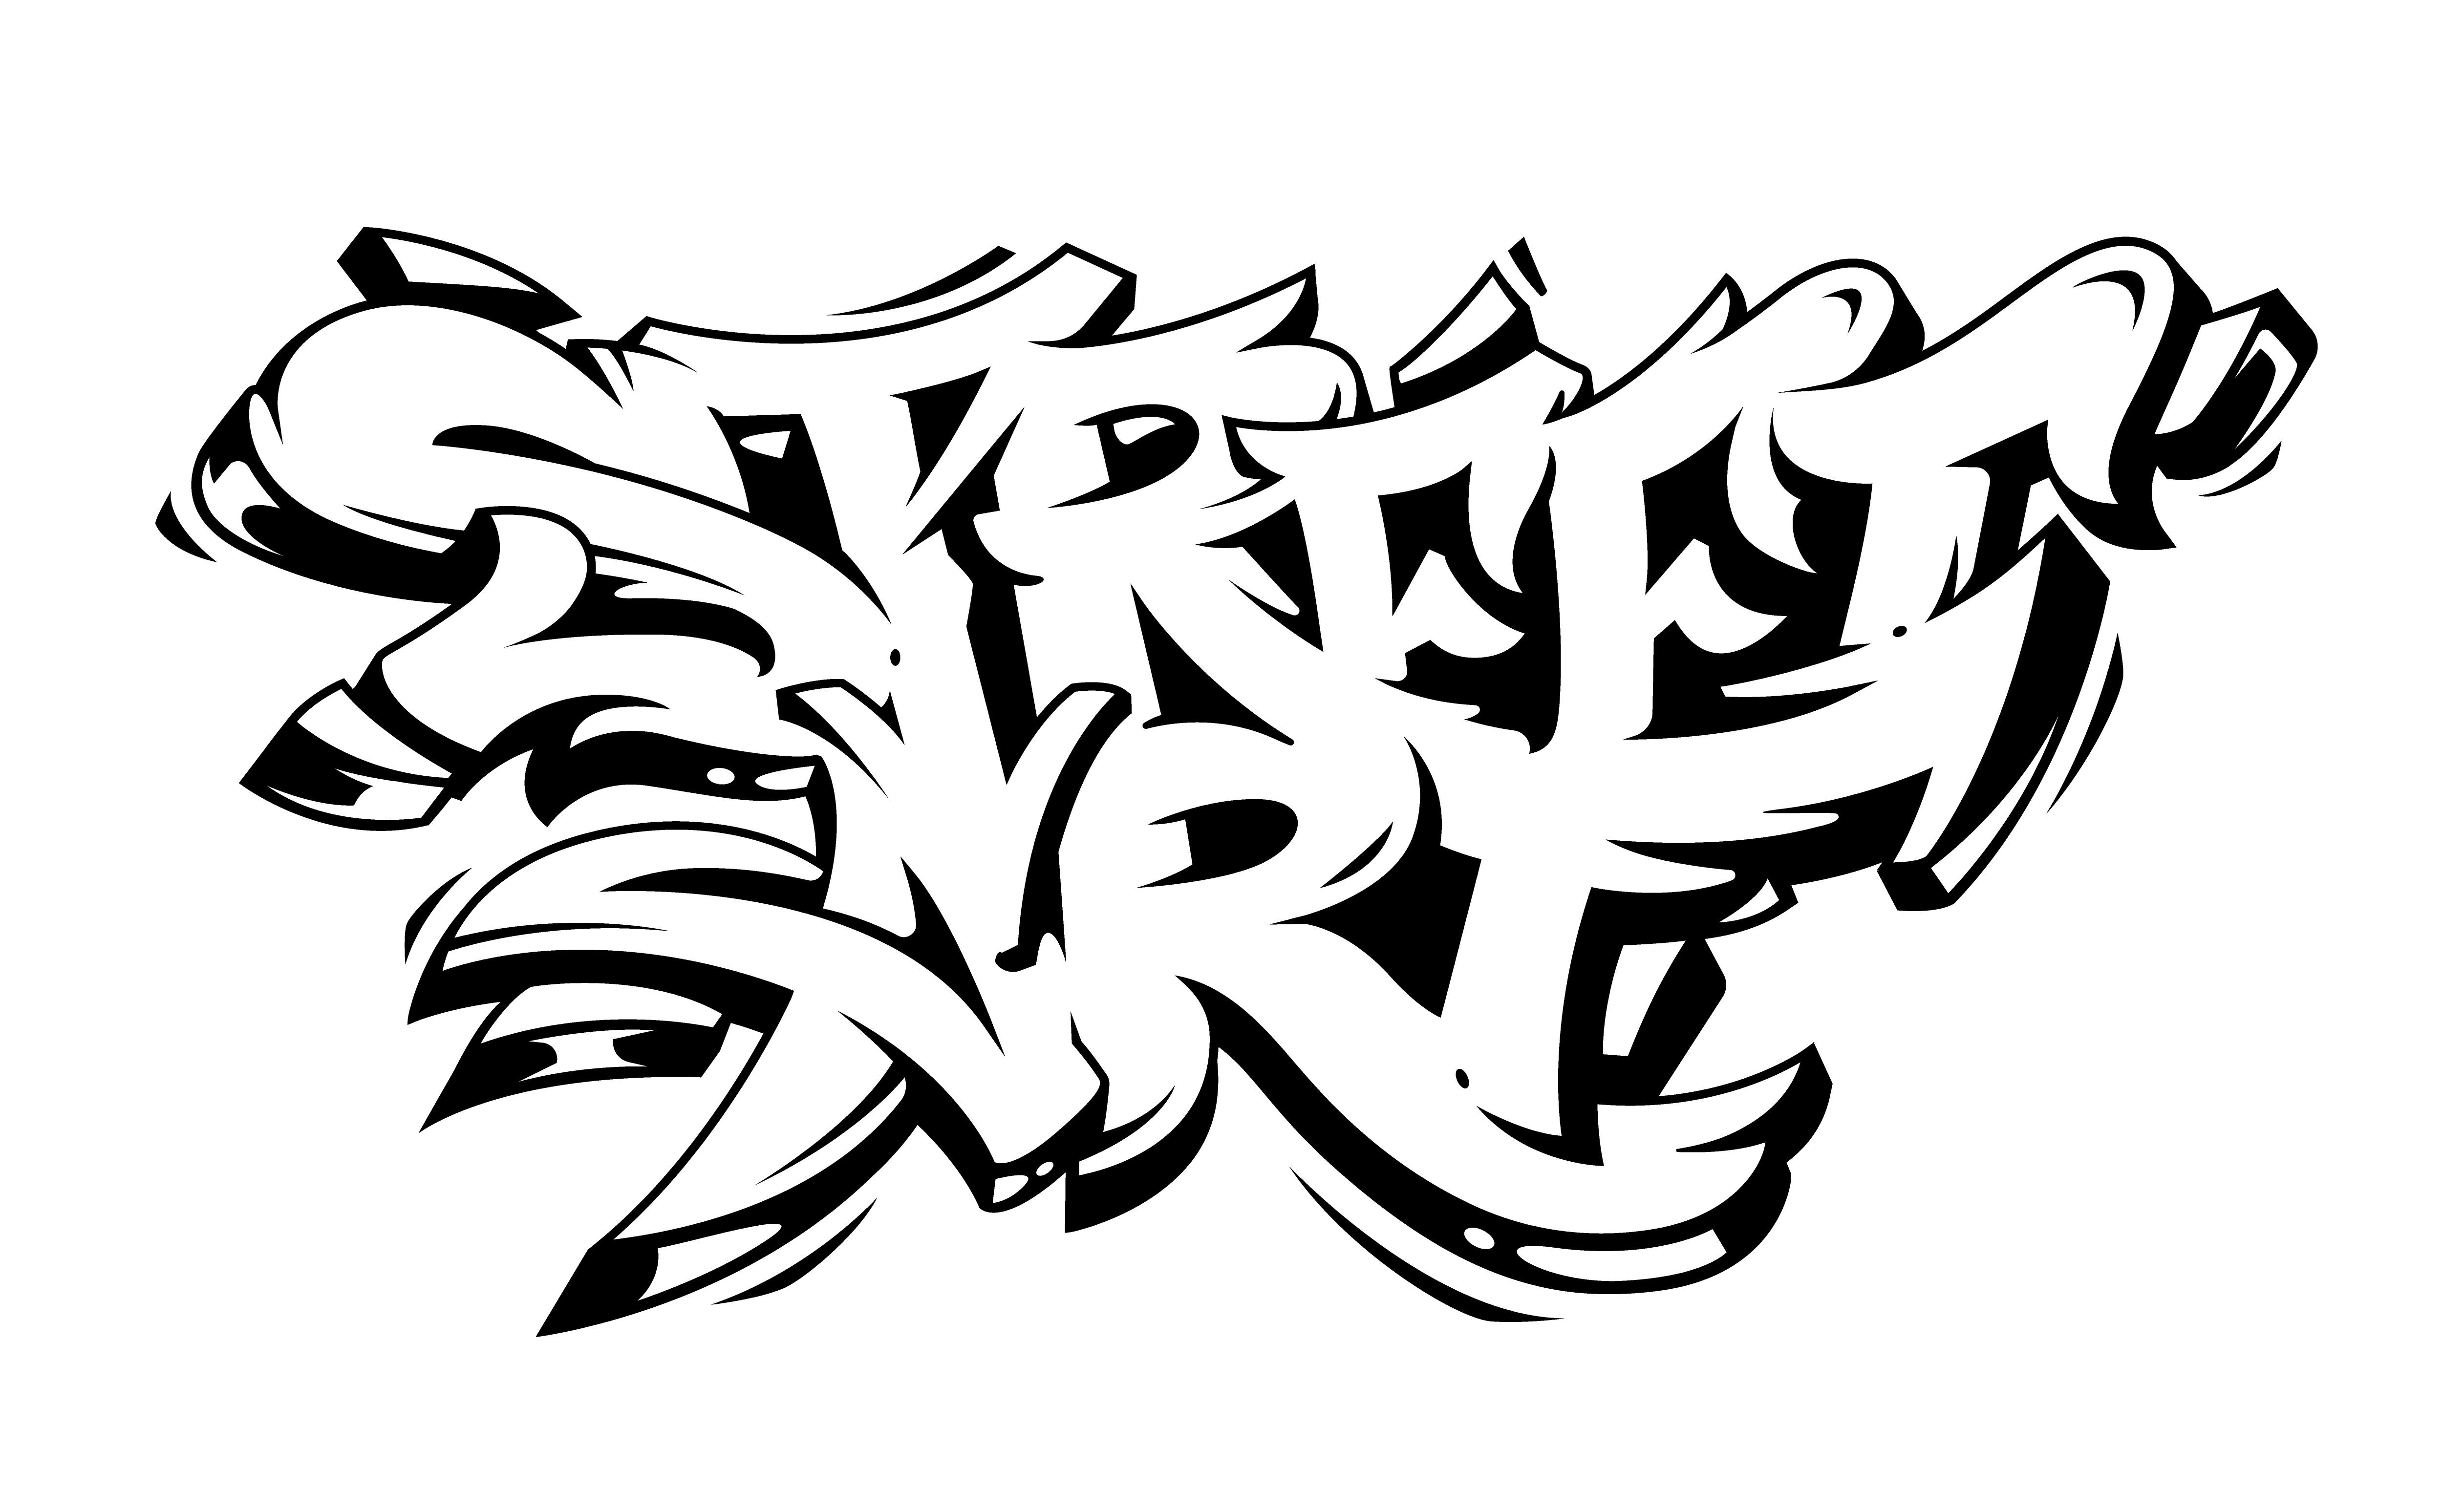 Street art graffiti vector lettering download free vectors